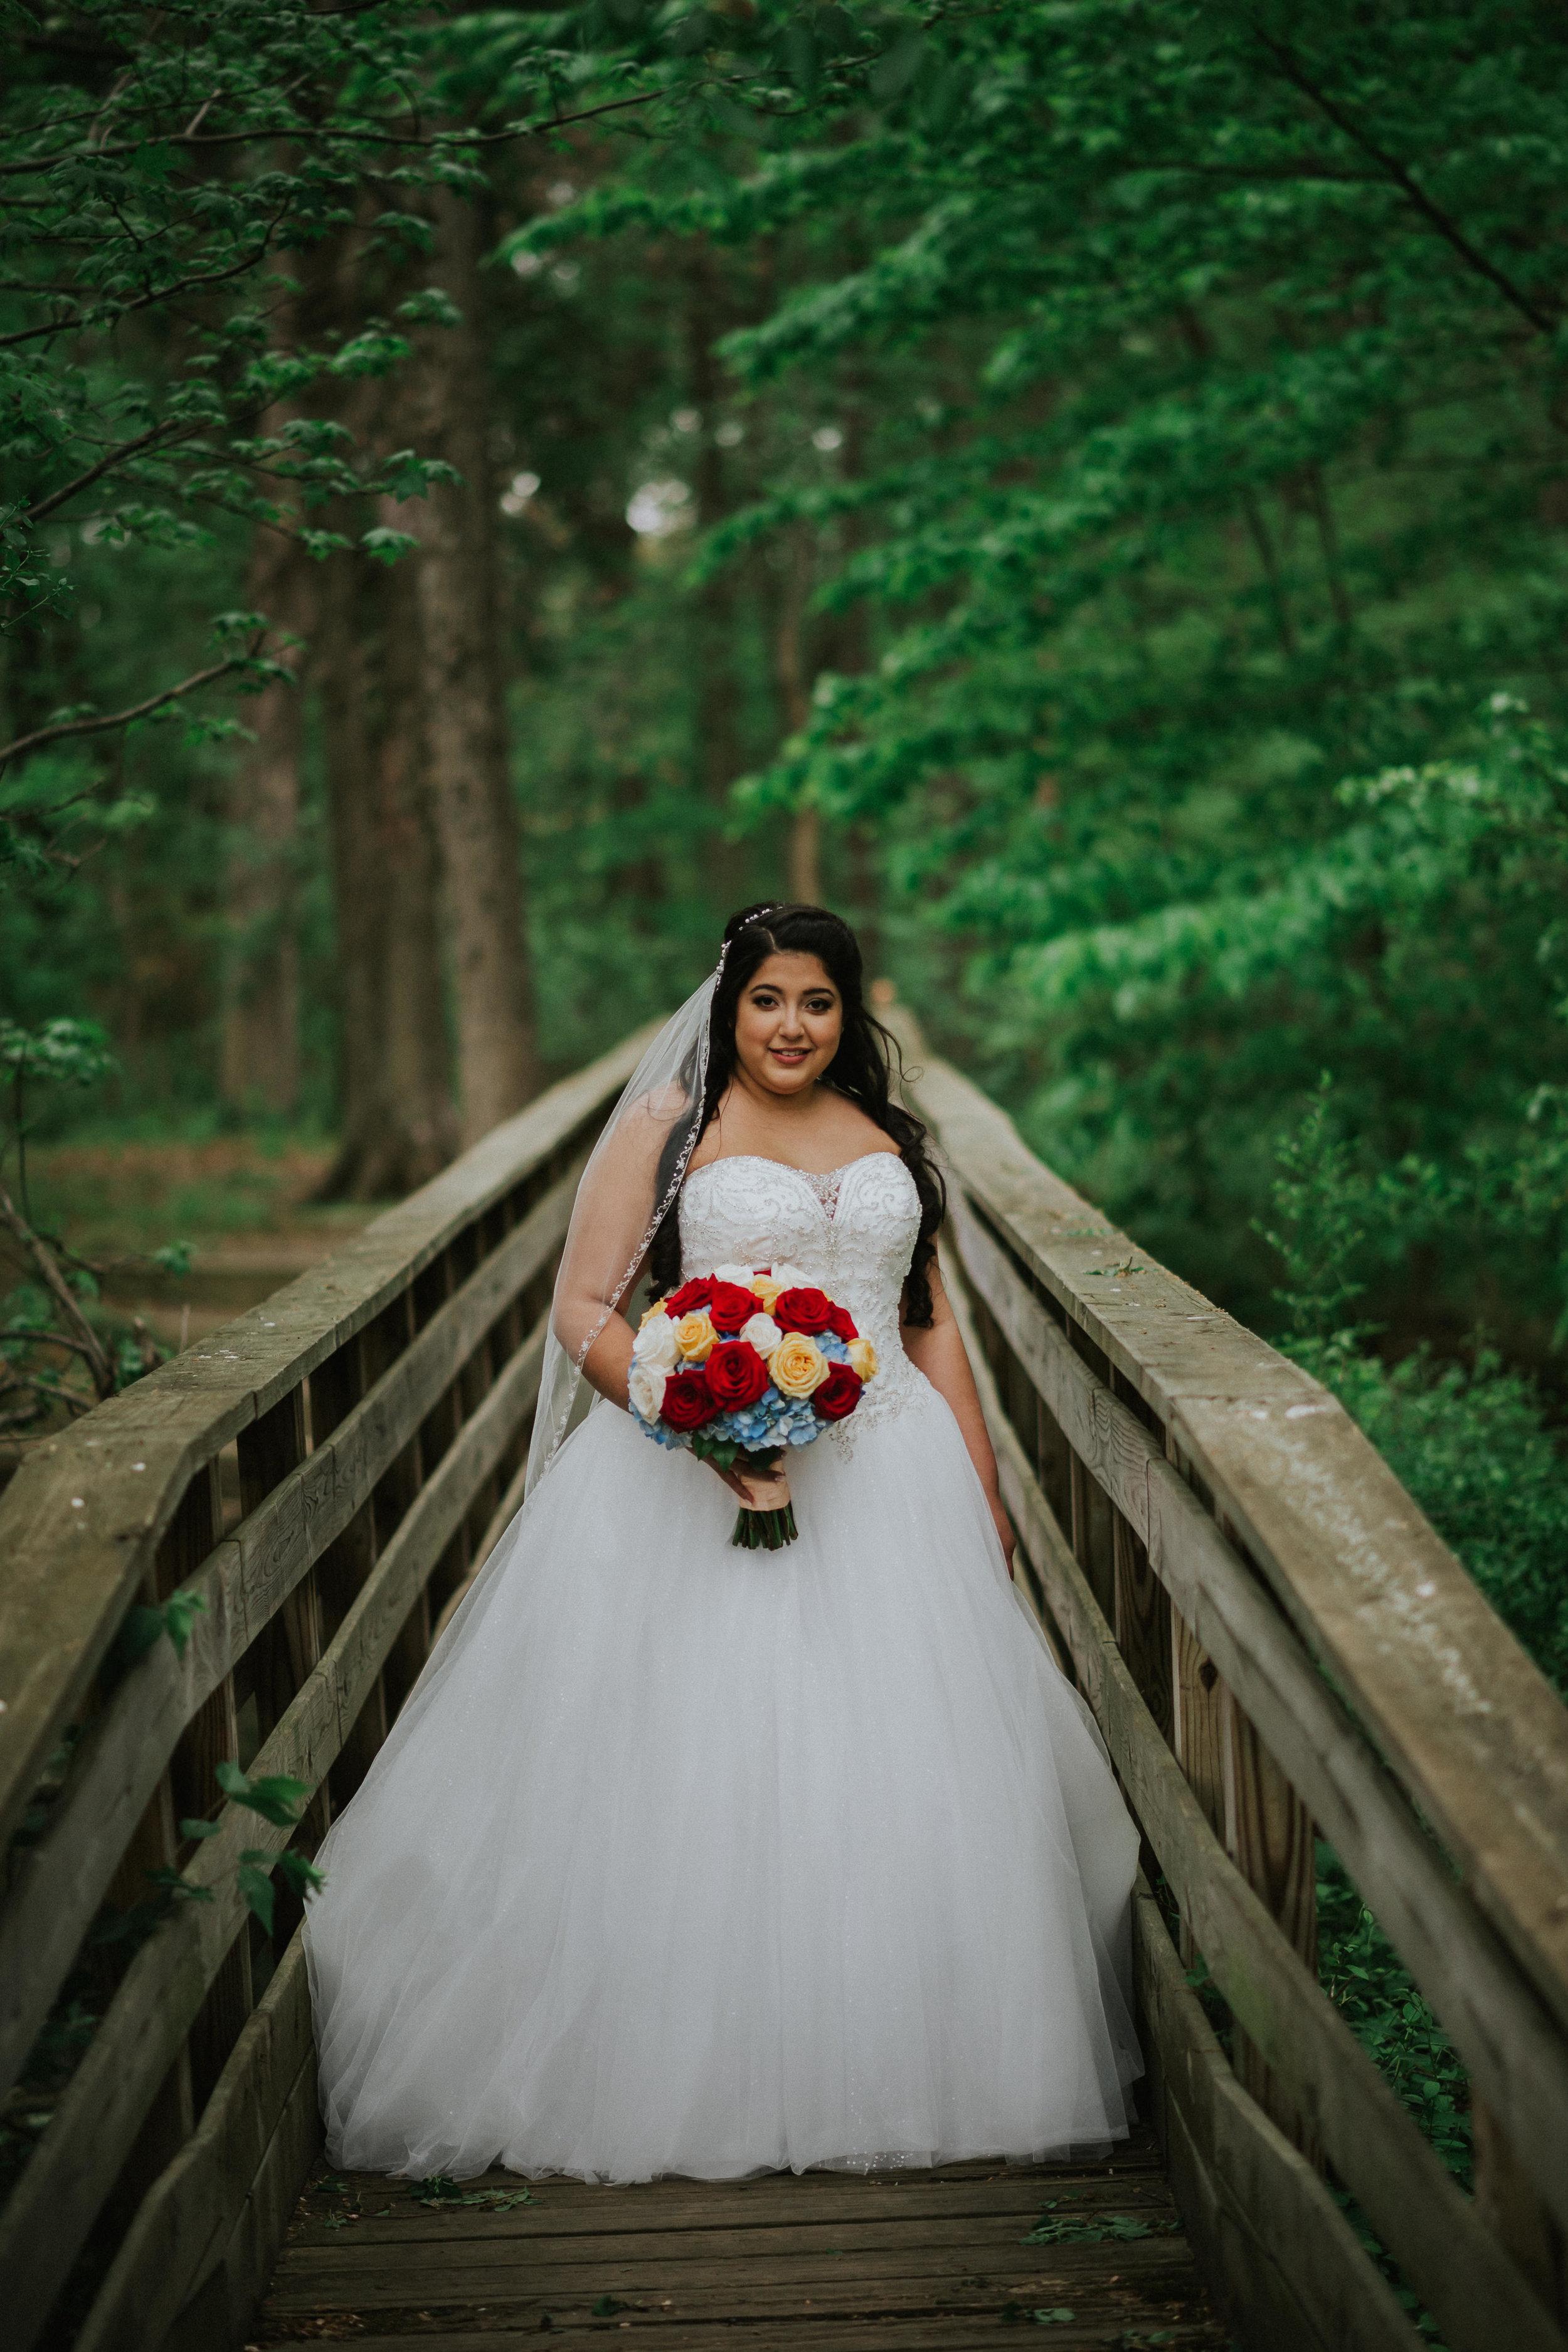 Barclay-Farmstead-Wedding-Rosa-and-Mike-409.jpg